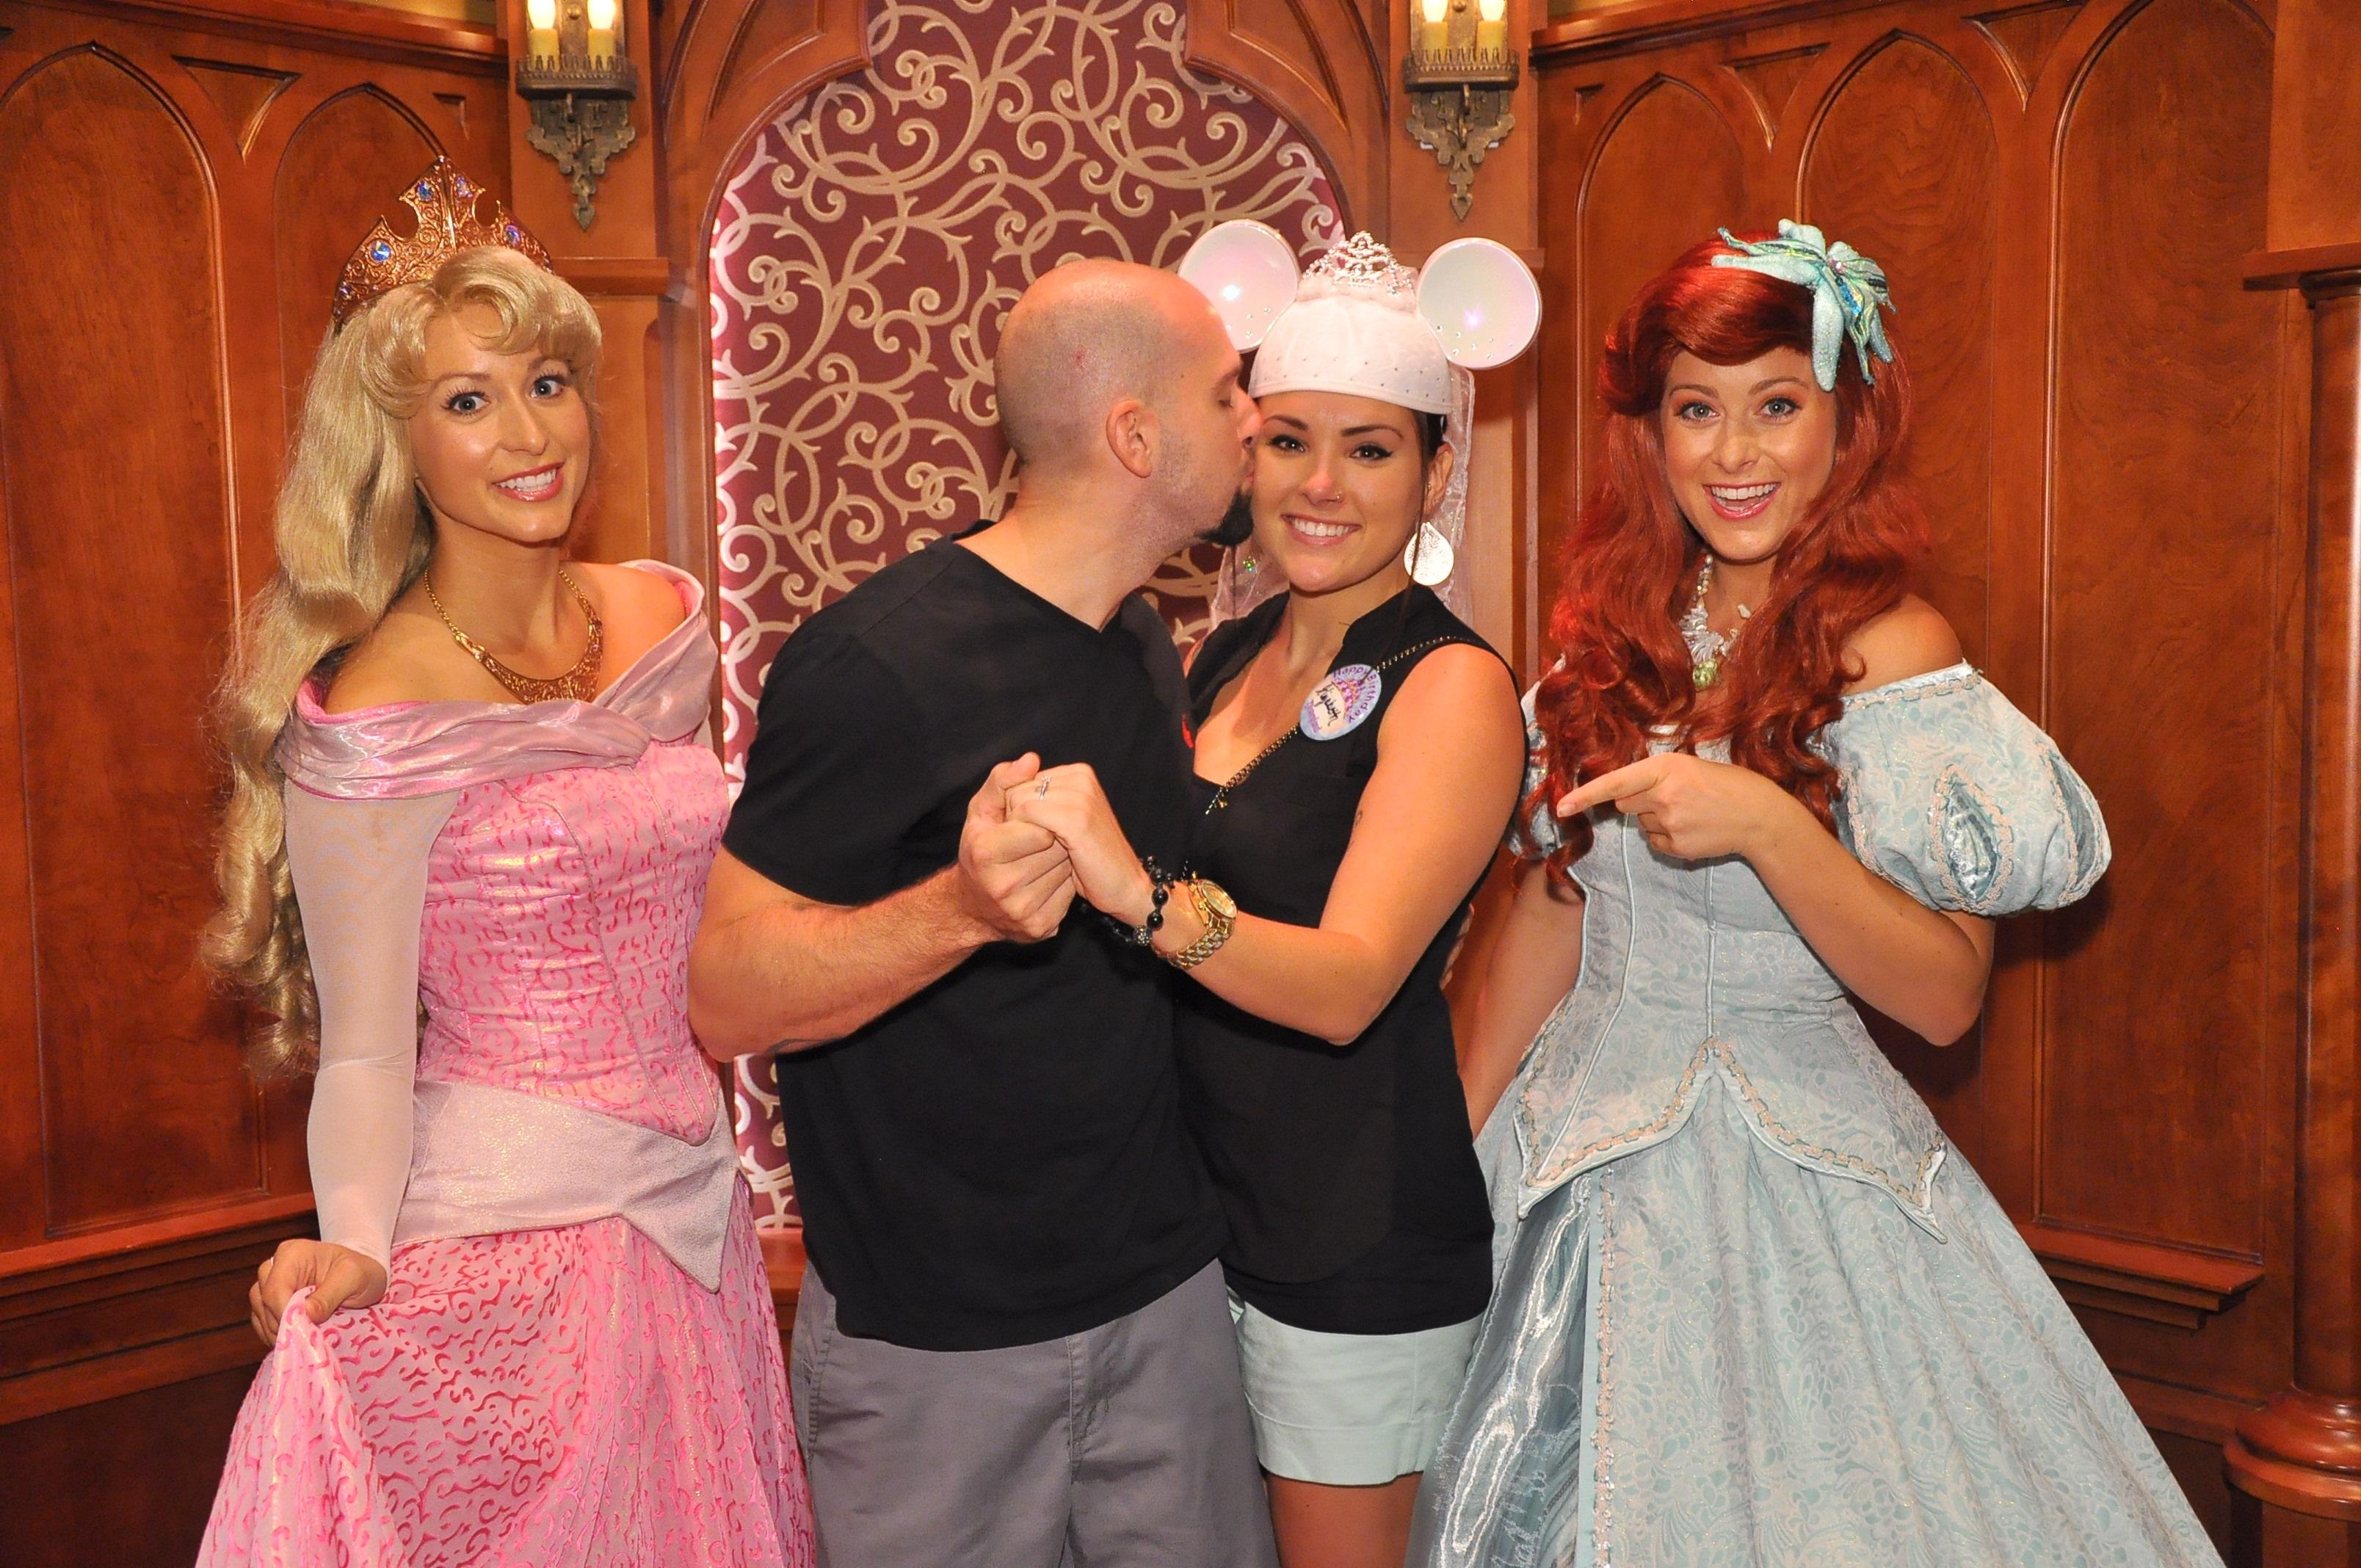 Image 11 of Elizabeth and Tommy's Disneyland Proposal